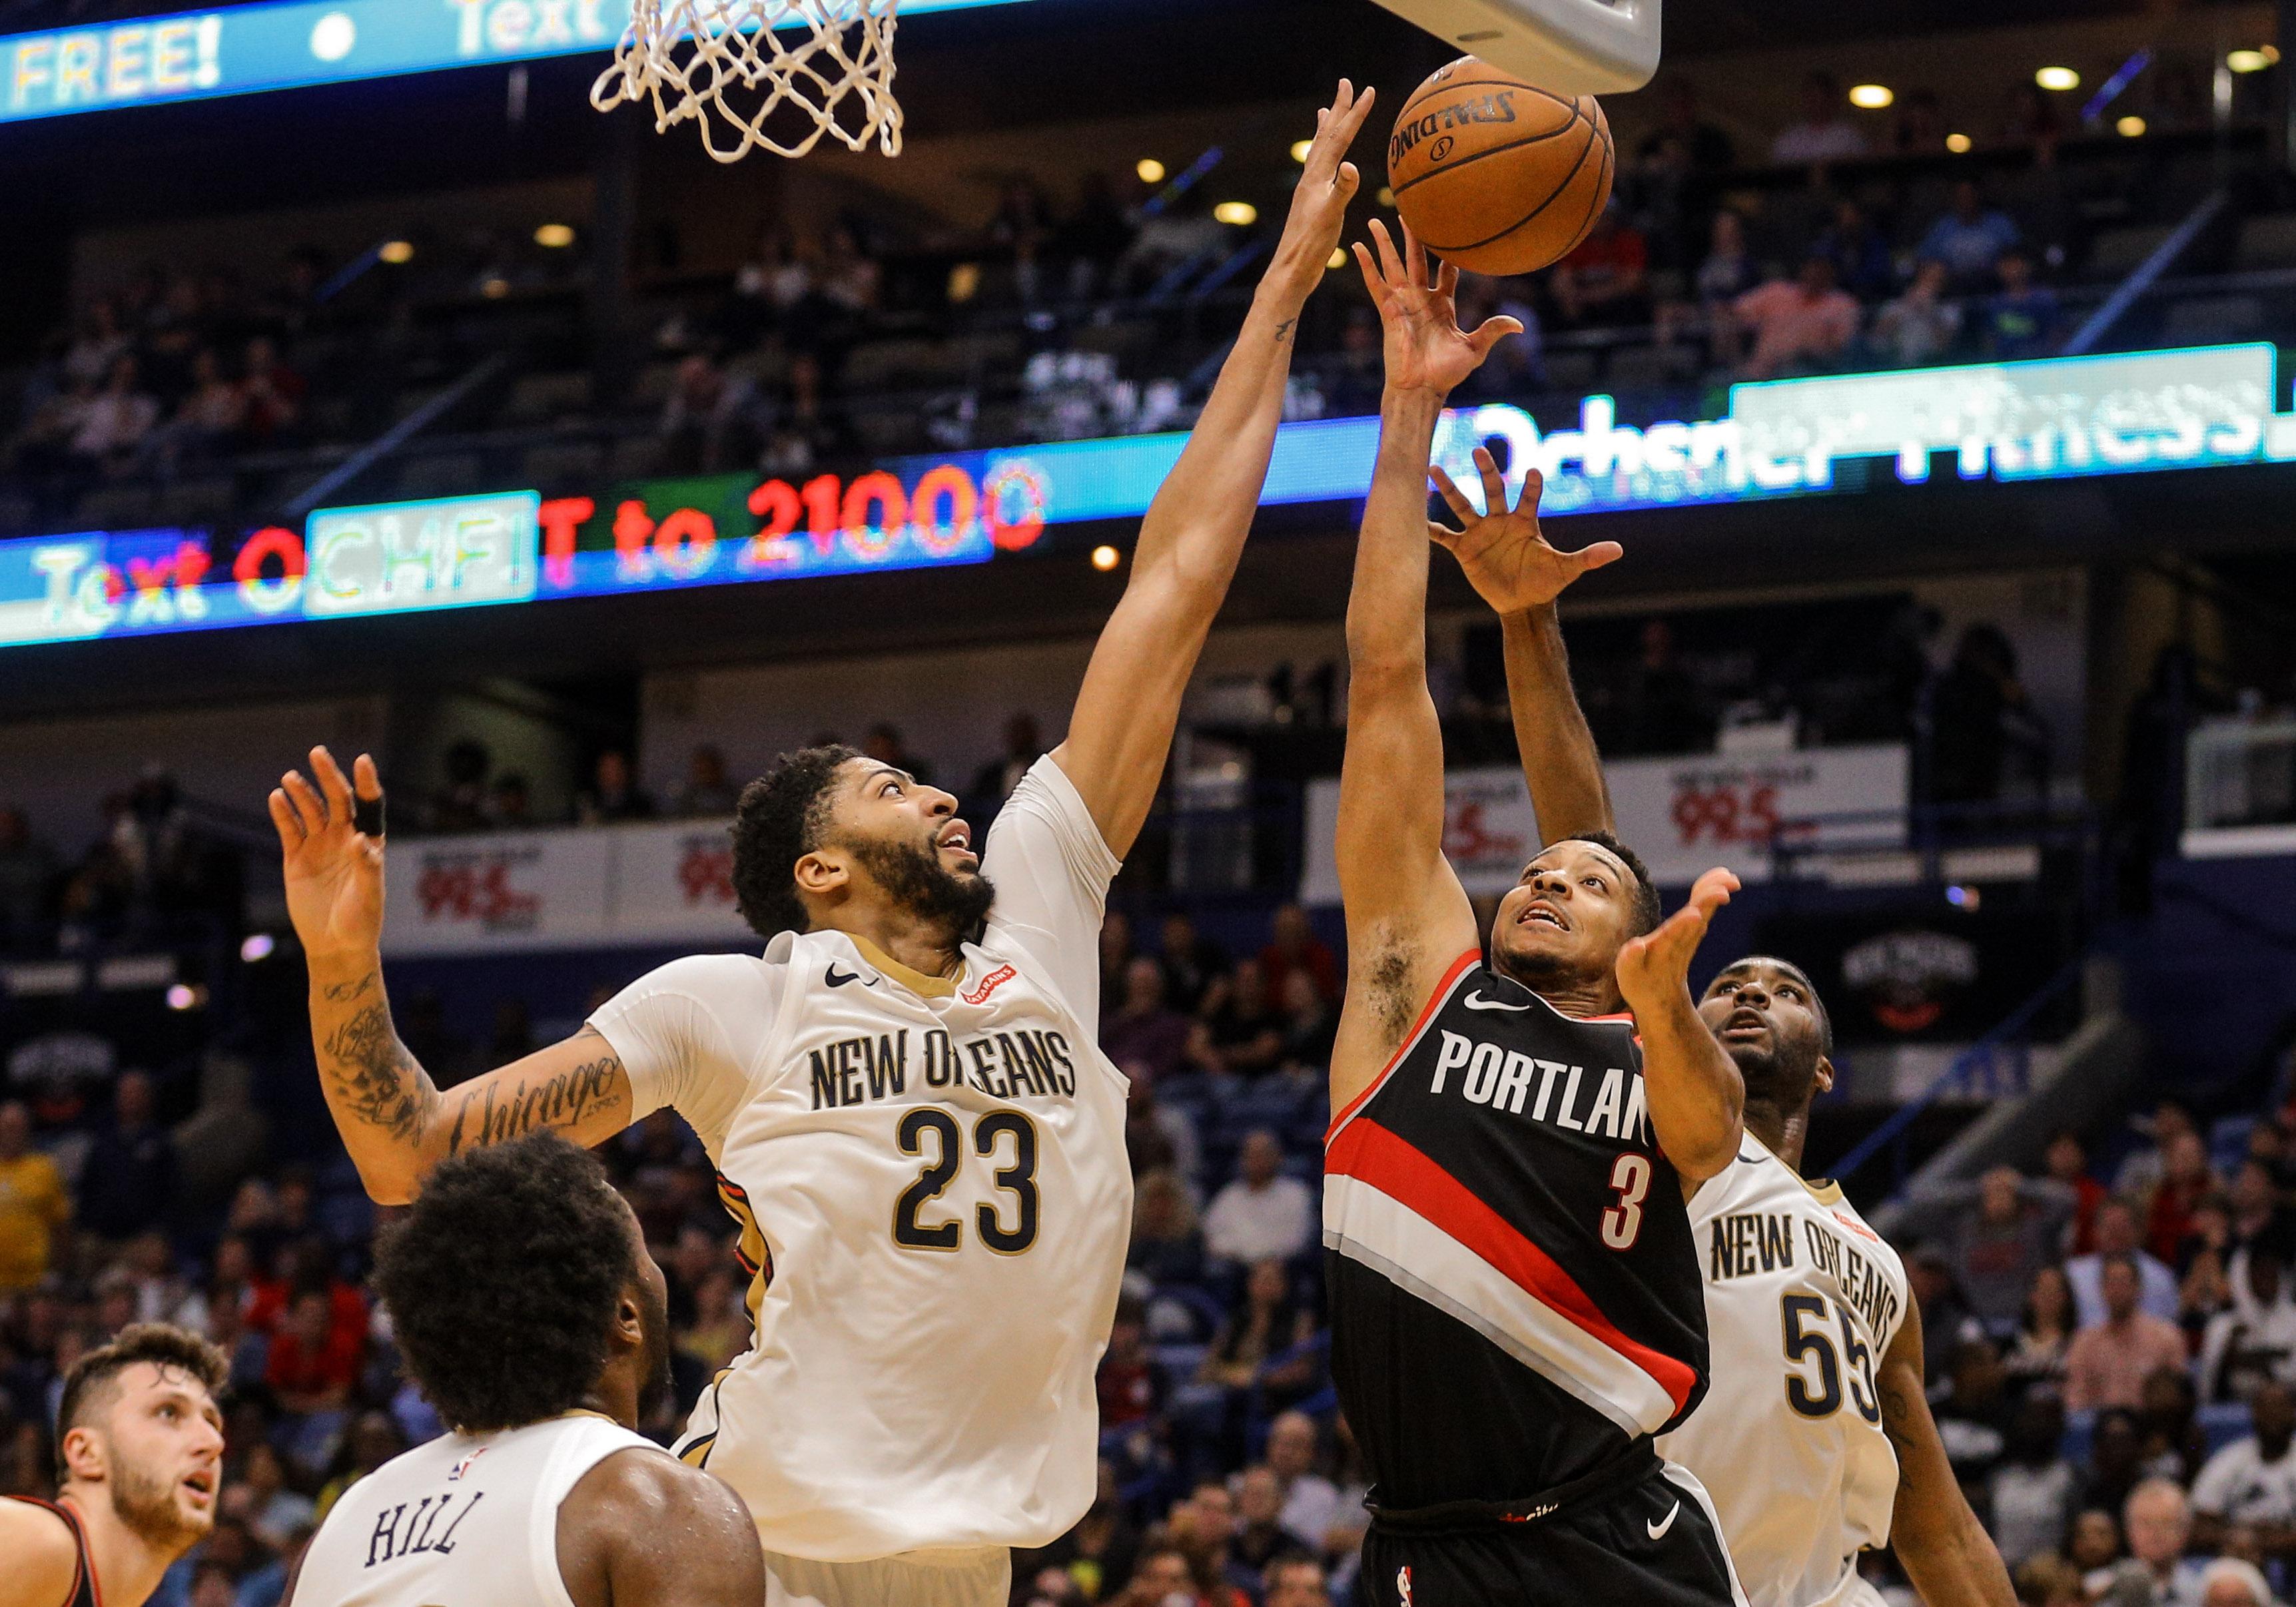 NBA: Portland Trail Blazers at New Orleans Pelicans